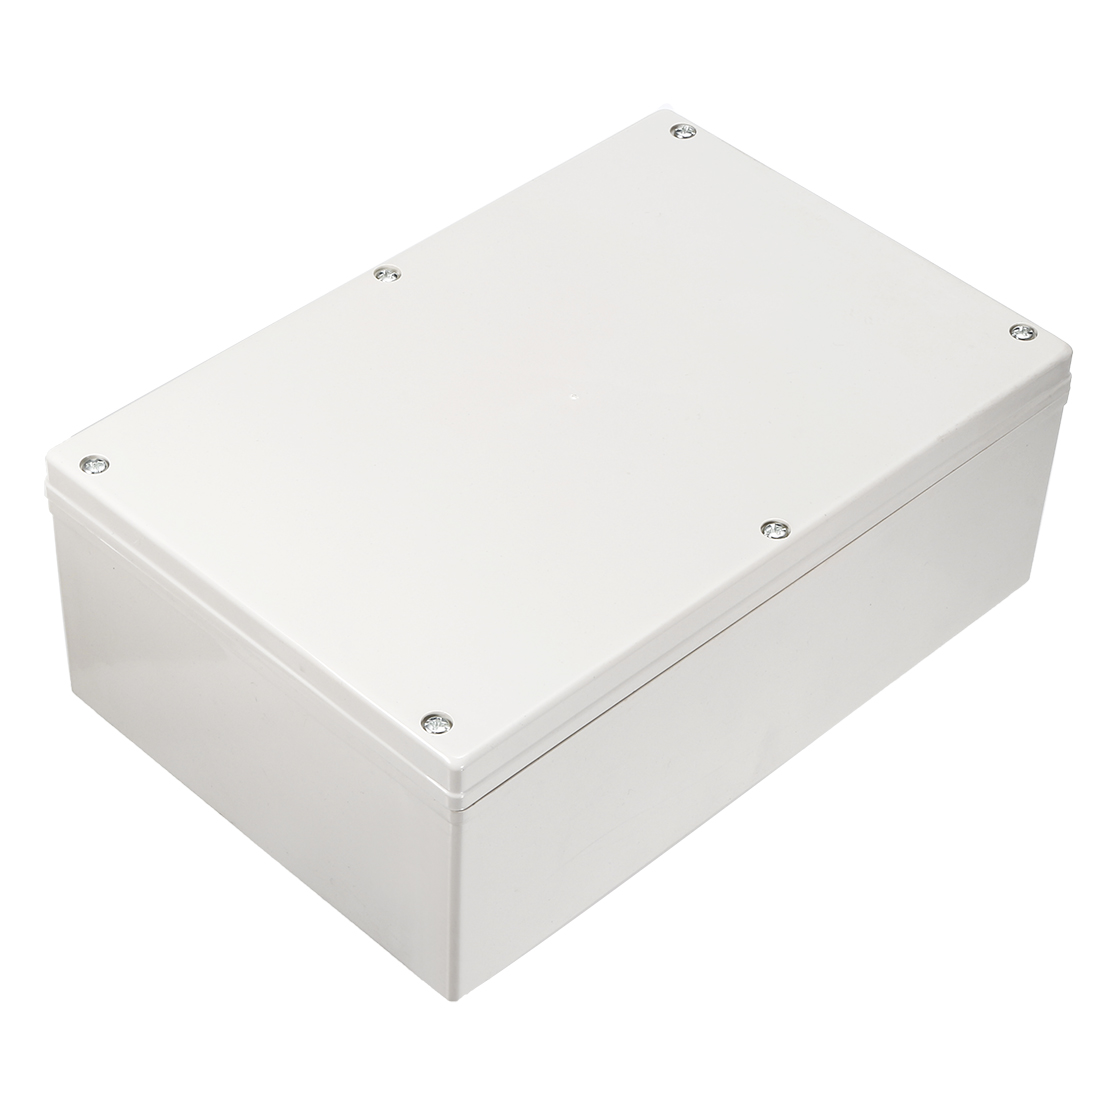 Rectangular Waterproof Plastic DIY Junction Box Case 240 x 159 x 90mm